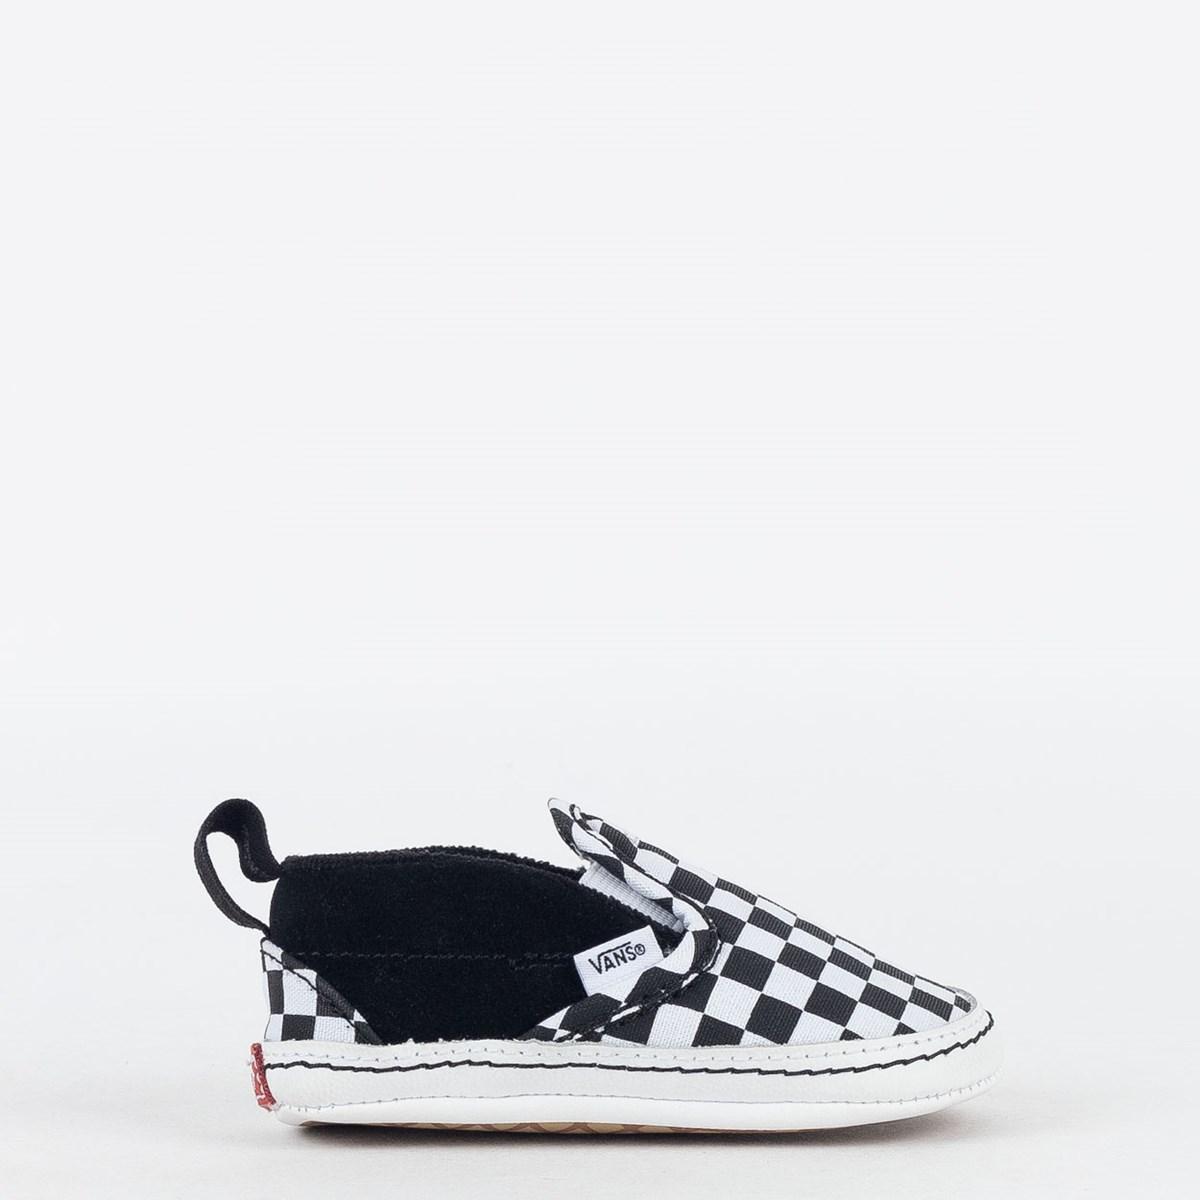 Tênis Vans Baby Slip On V Crib Checker Black True White VN0A2XSLFB7